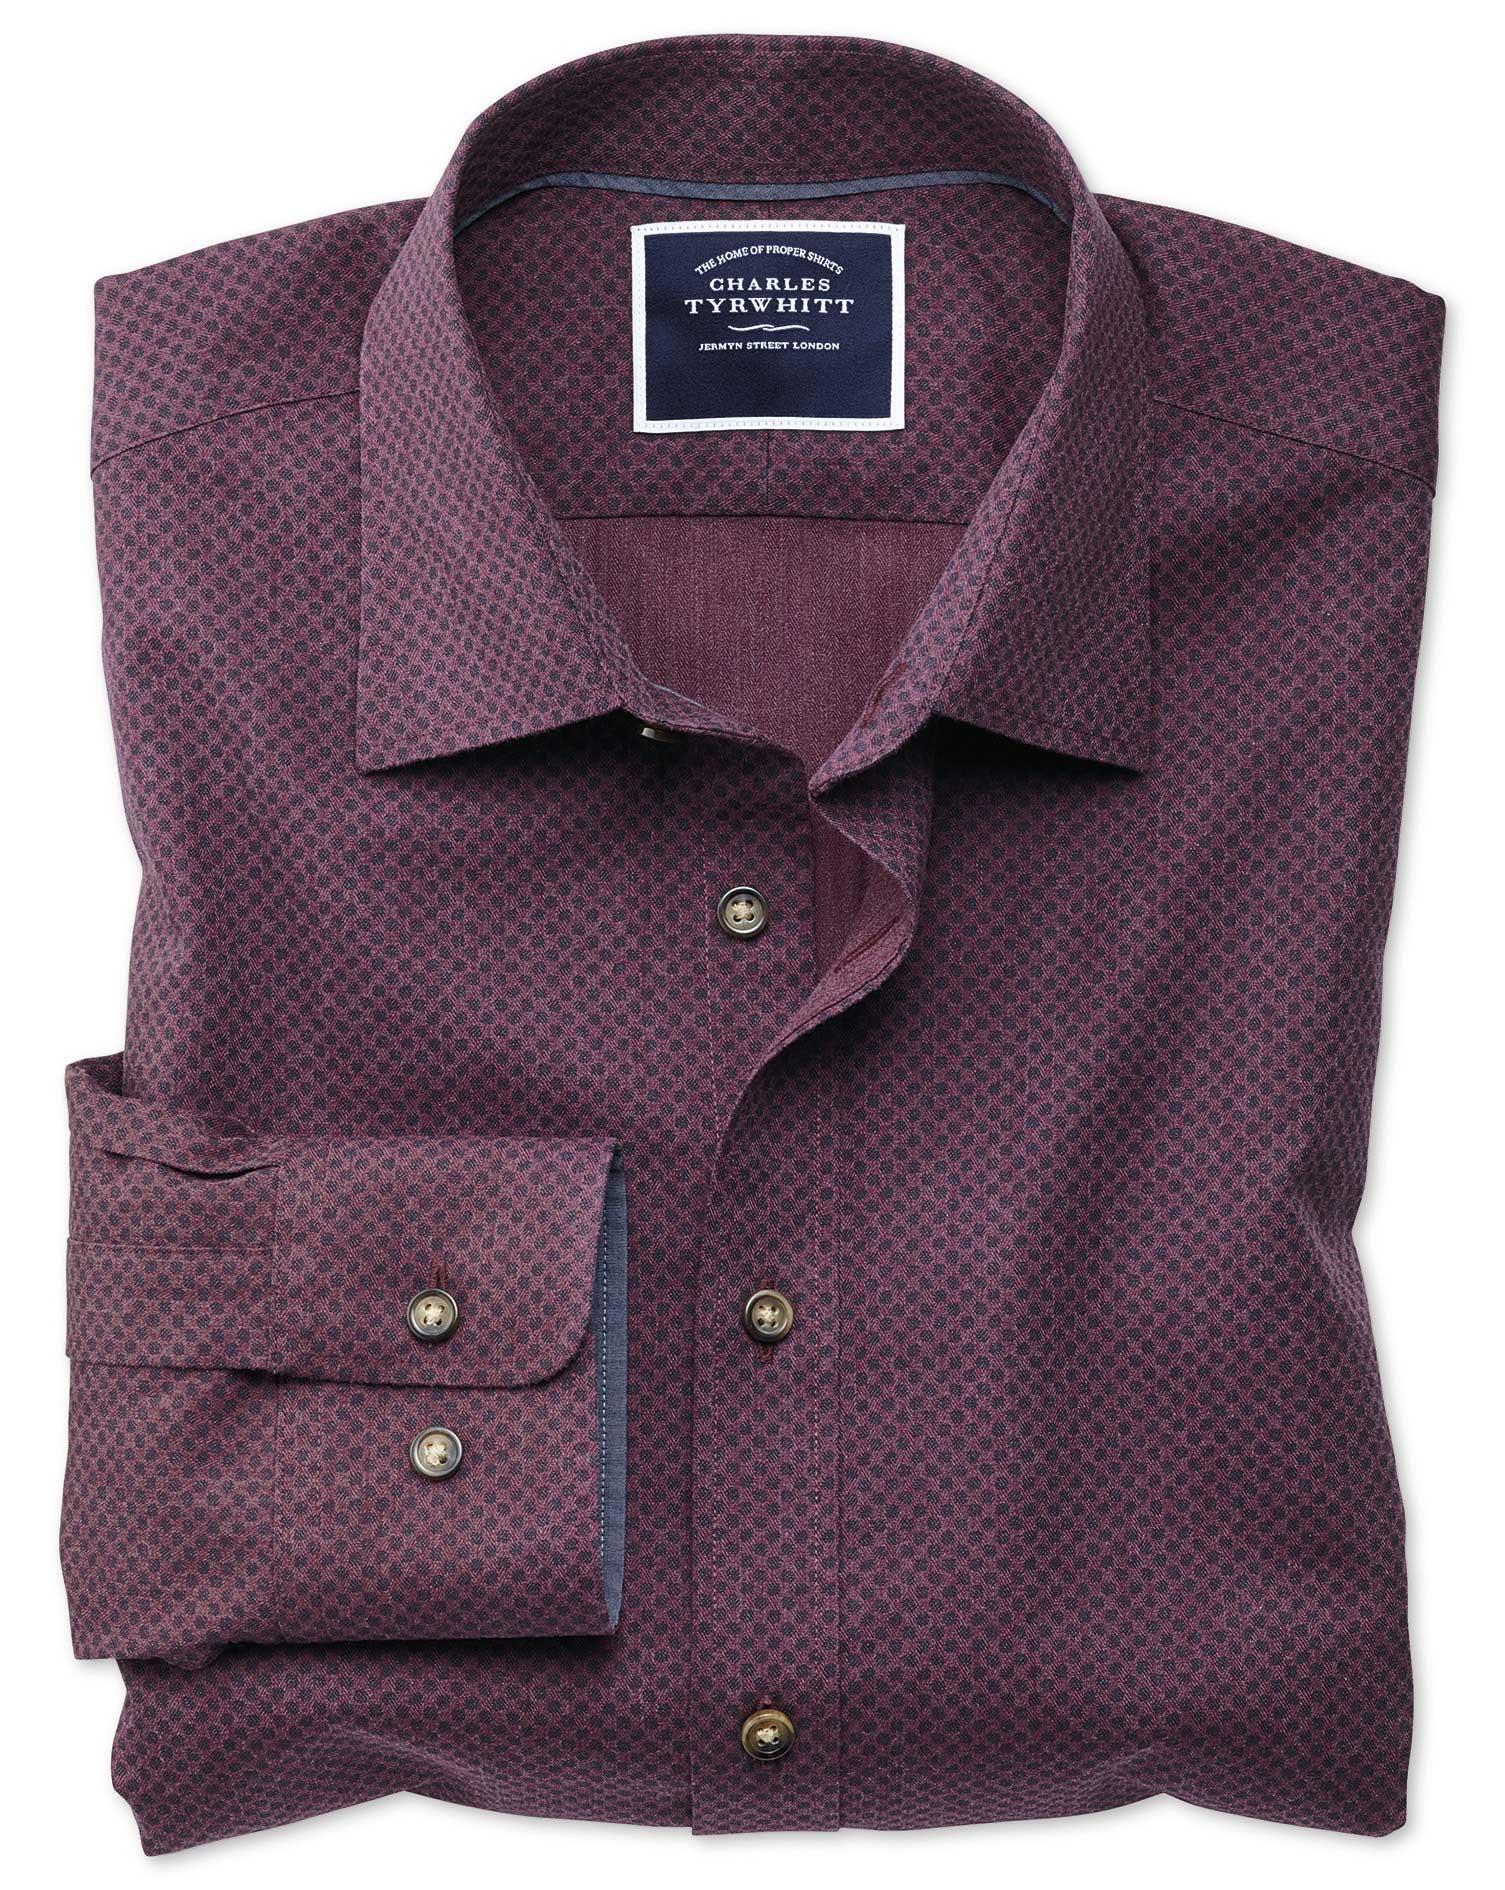 Slim Fit Burgundy Spot Print Cotton Shirt Single Cuff Size Large by Charles Tyrwhitt